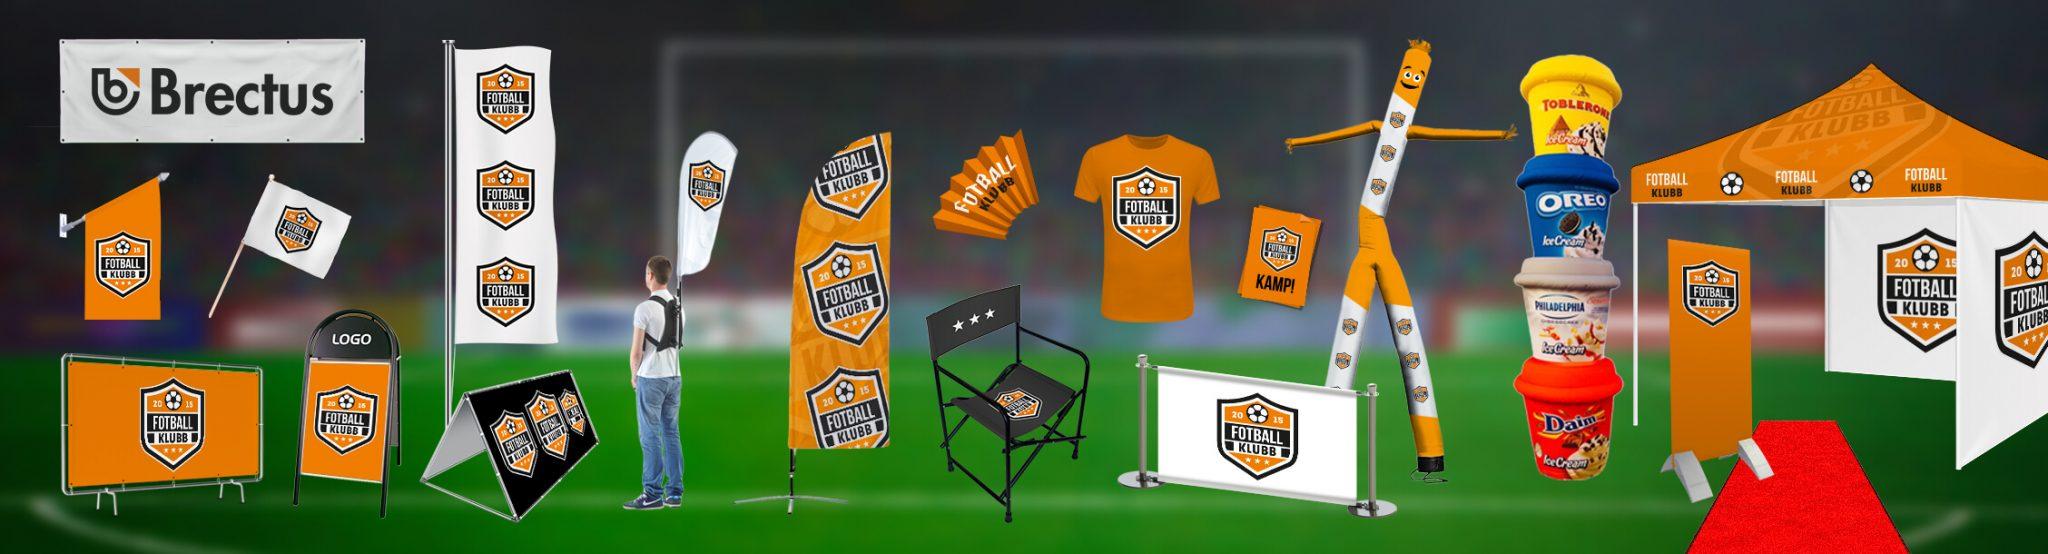 Fotball Brectus Arena Reklame